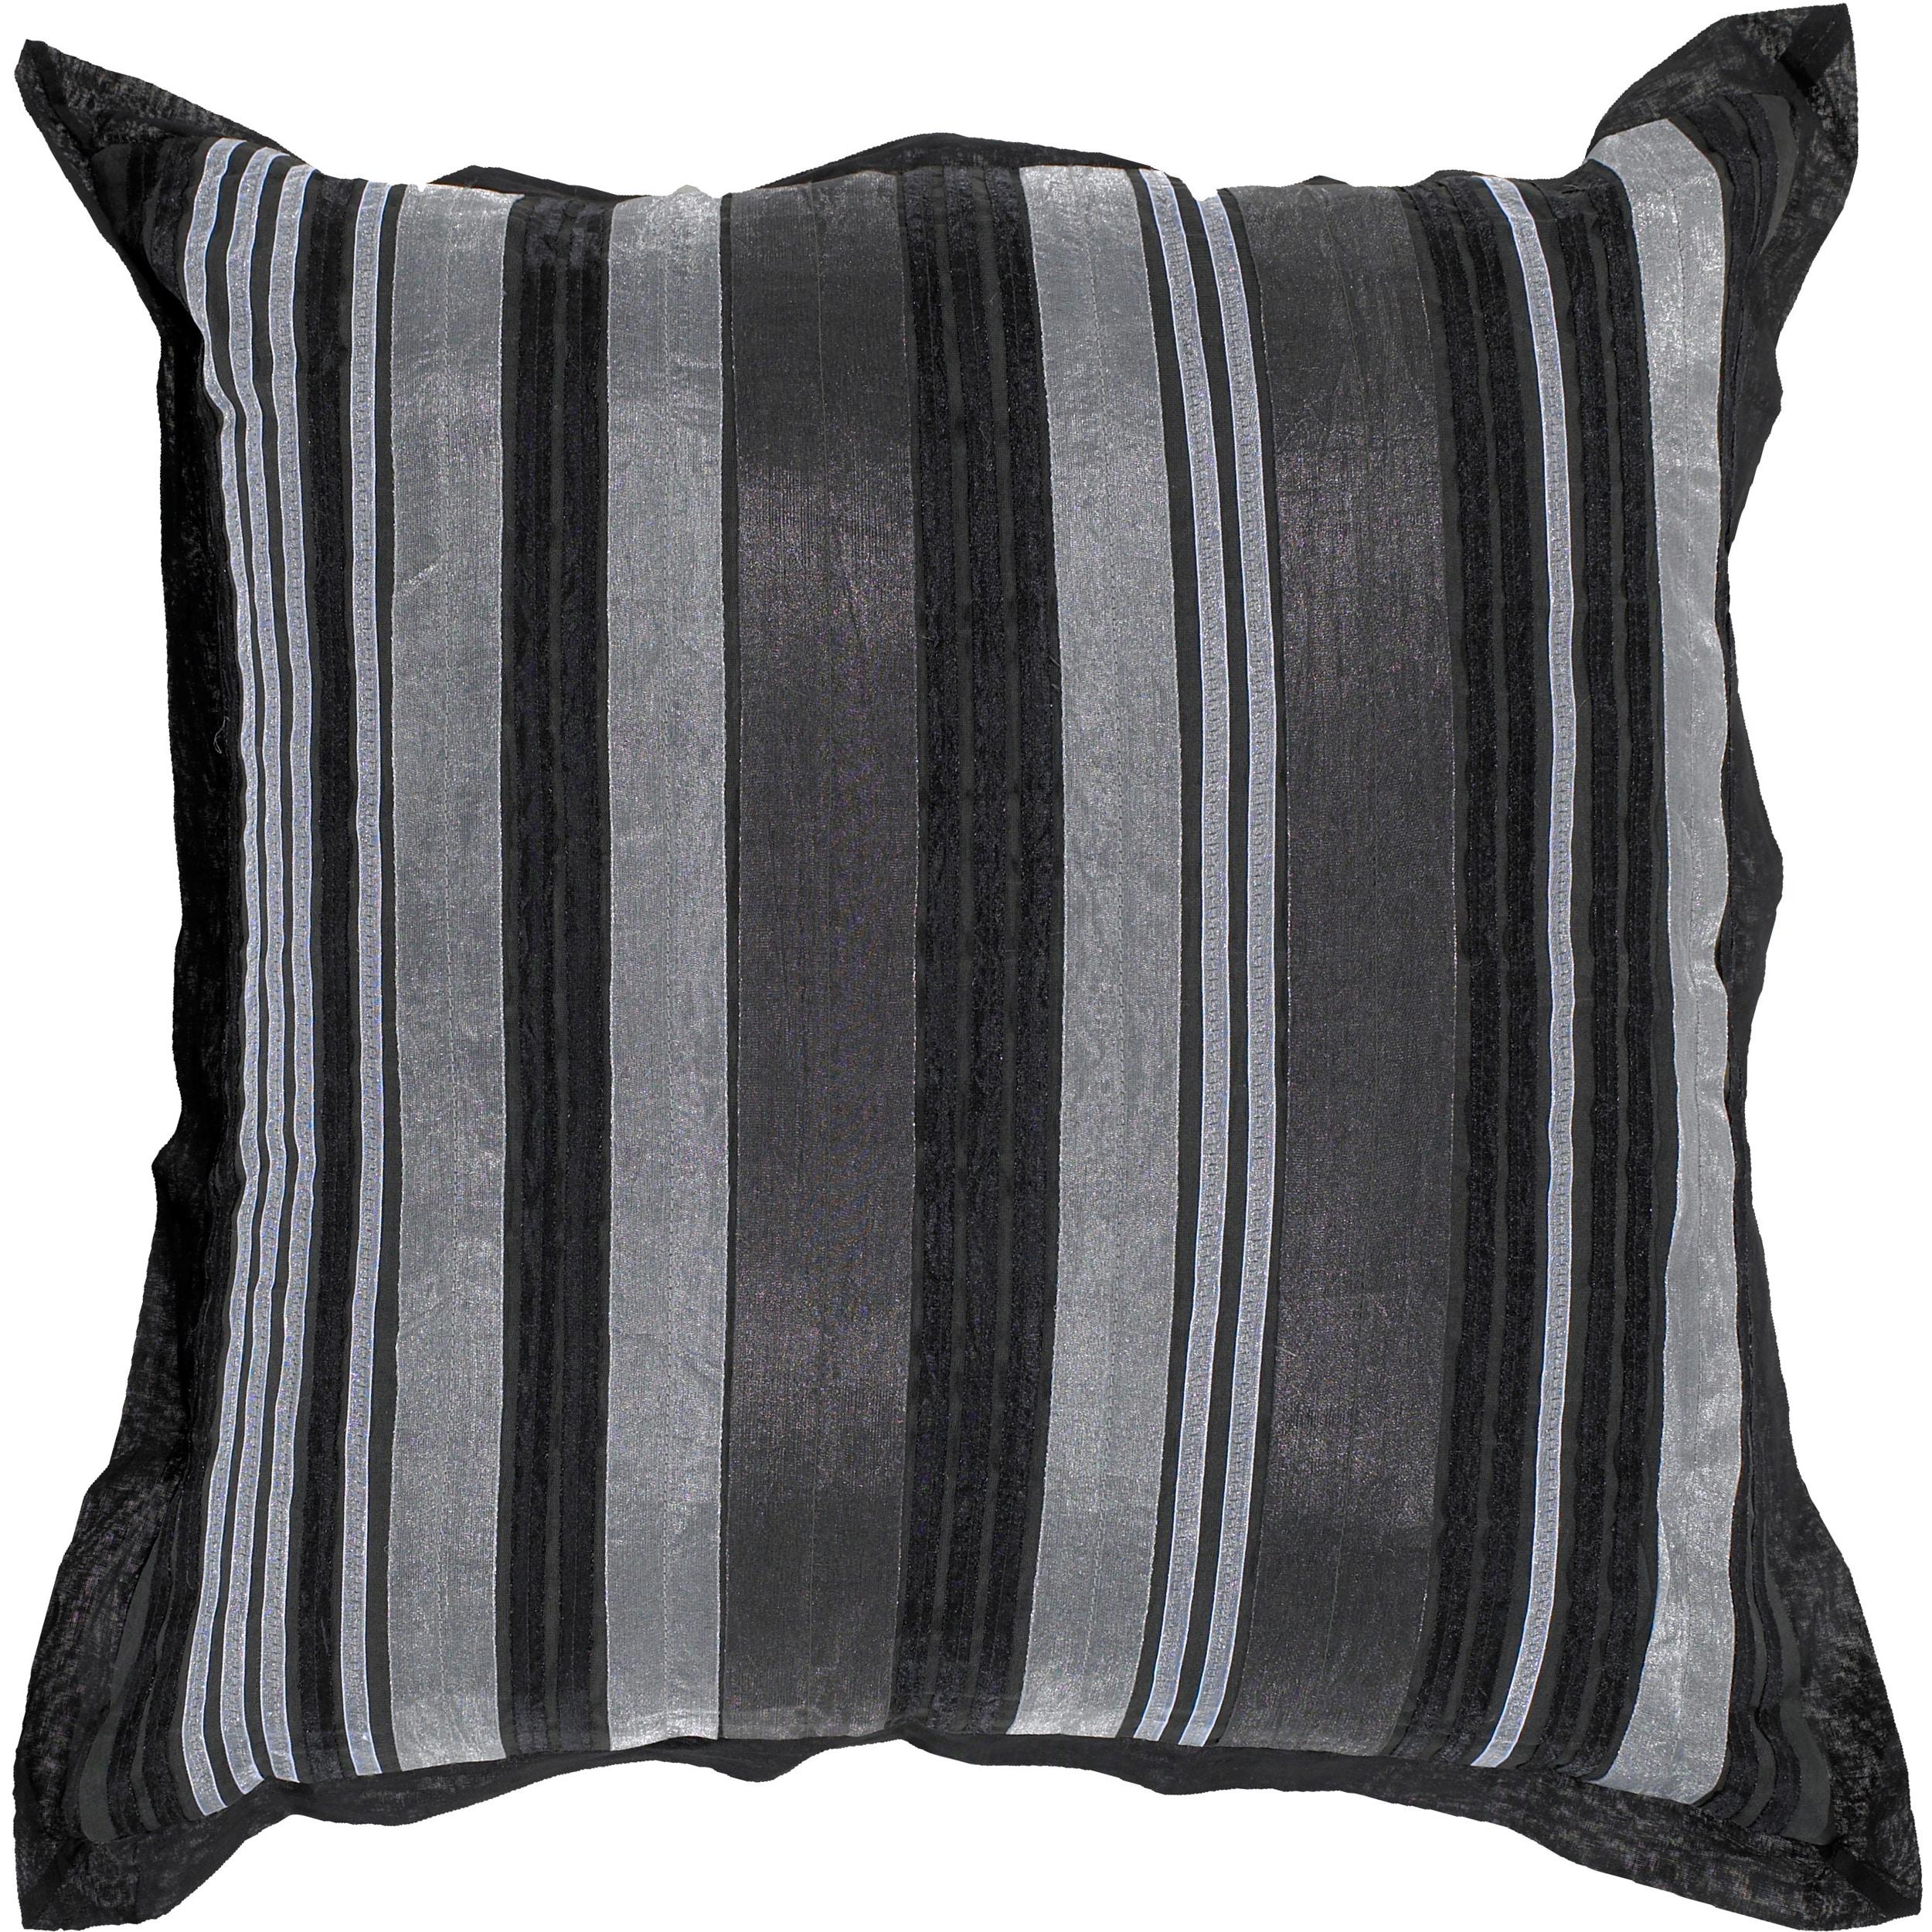 Decorative 18-inch Basel Pillow